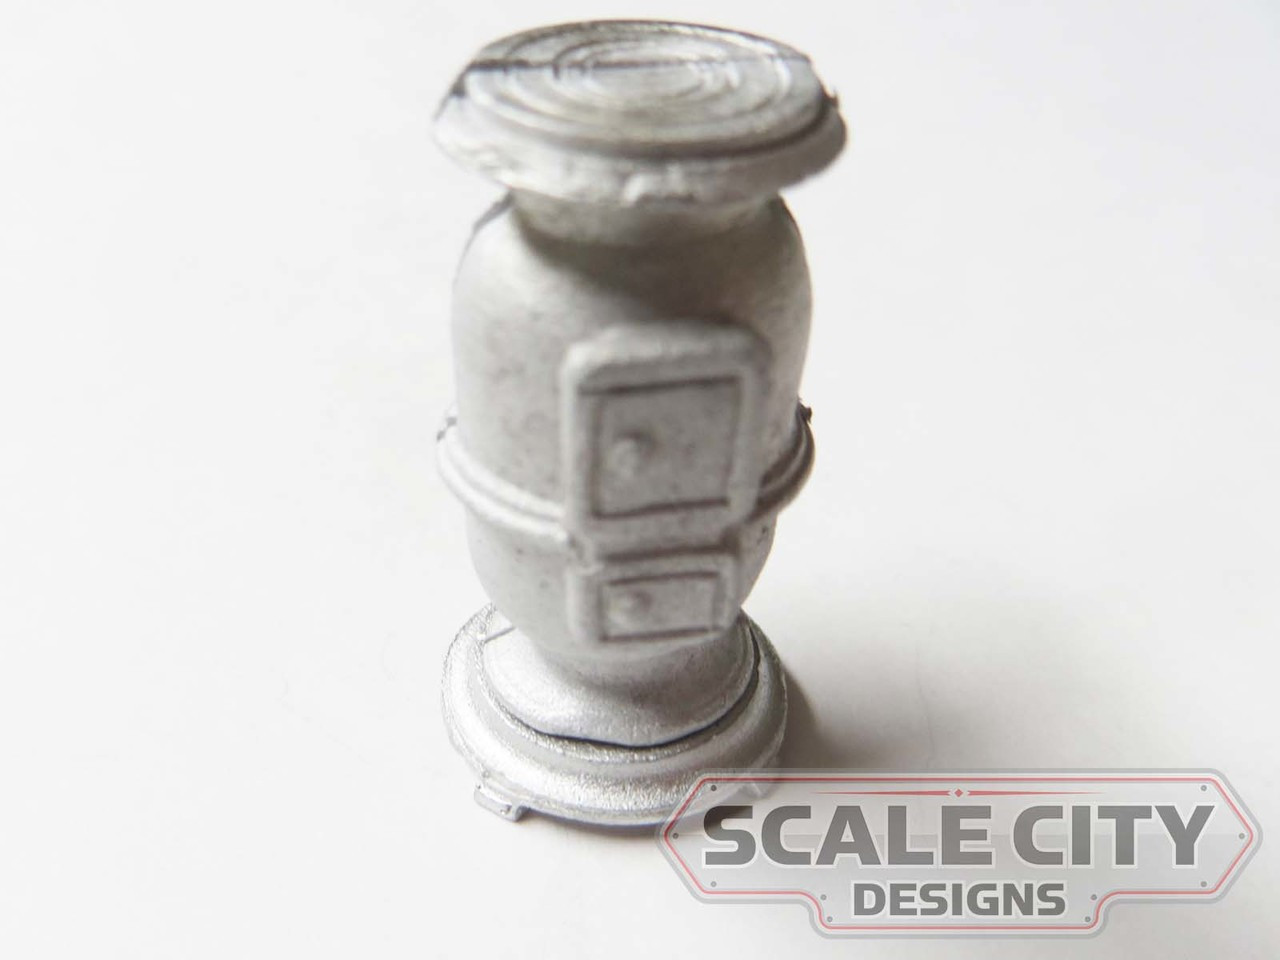 48-755 Pot Belly Stove O Scale FKA KEIL LINE